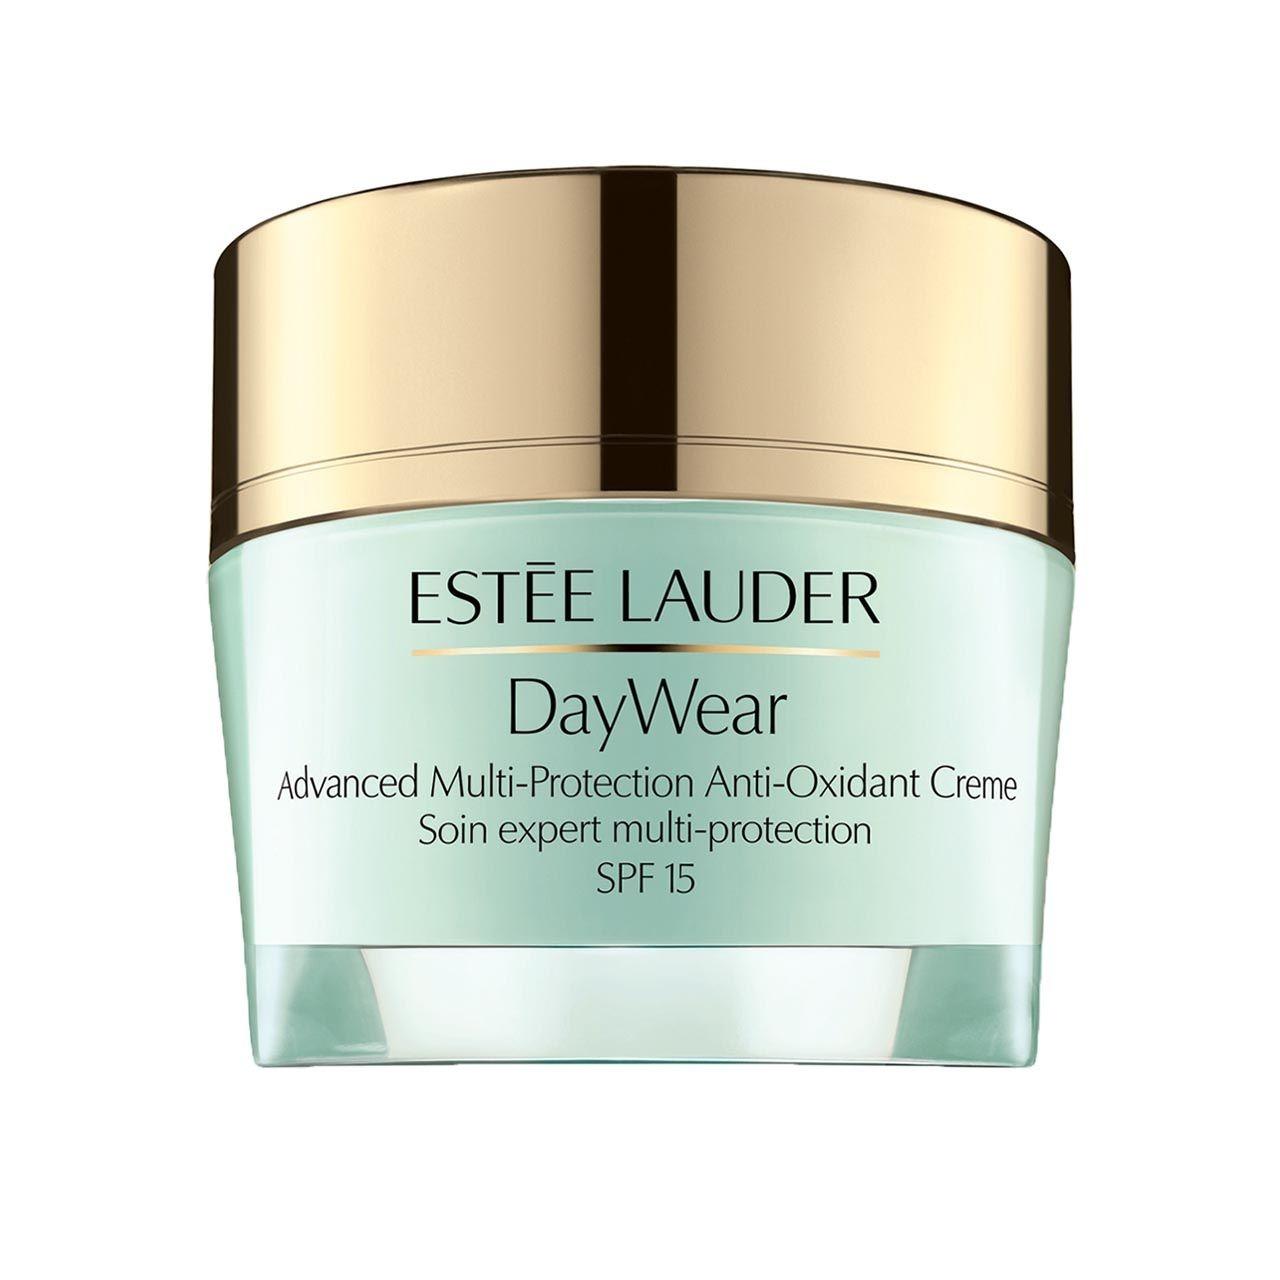 Estee Lauder DayWear Advanced MultiProtection crema antiossidante SPF 15 50 ml